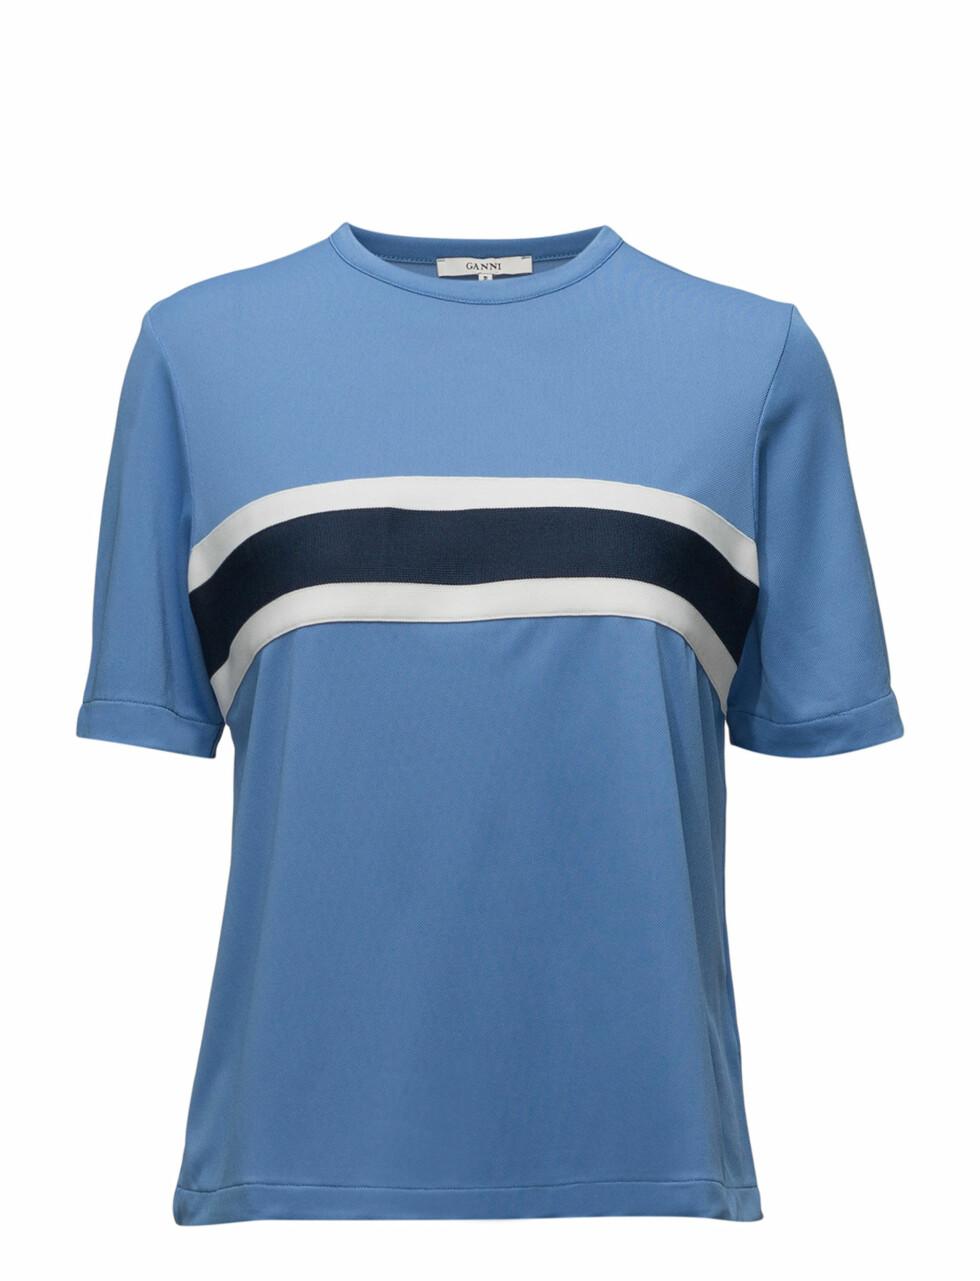 T-skjorte fra Ganni via Net-a-porter |1260,-|https://www.net-a-porter.com/no/en/product/1029844/ganni/dubois-striped-stretch-pique-t-shirt